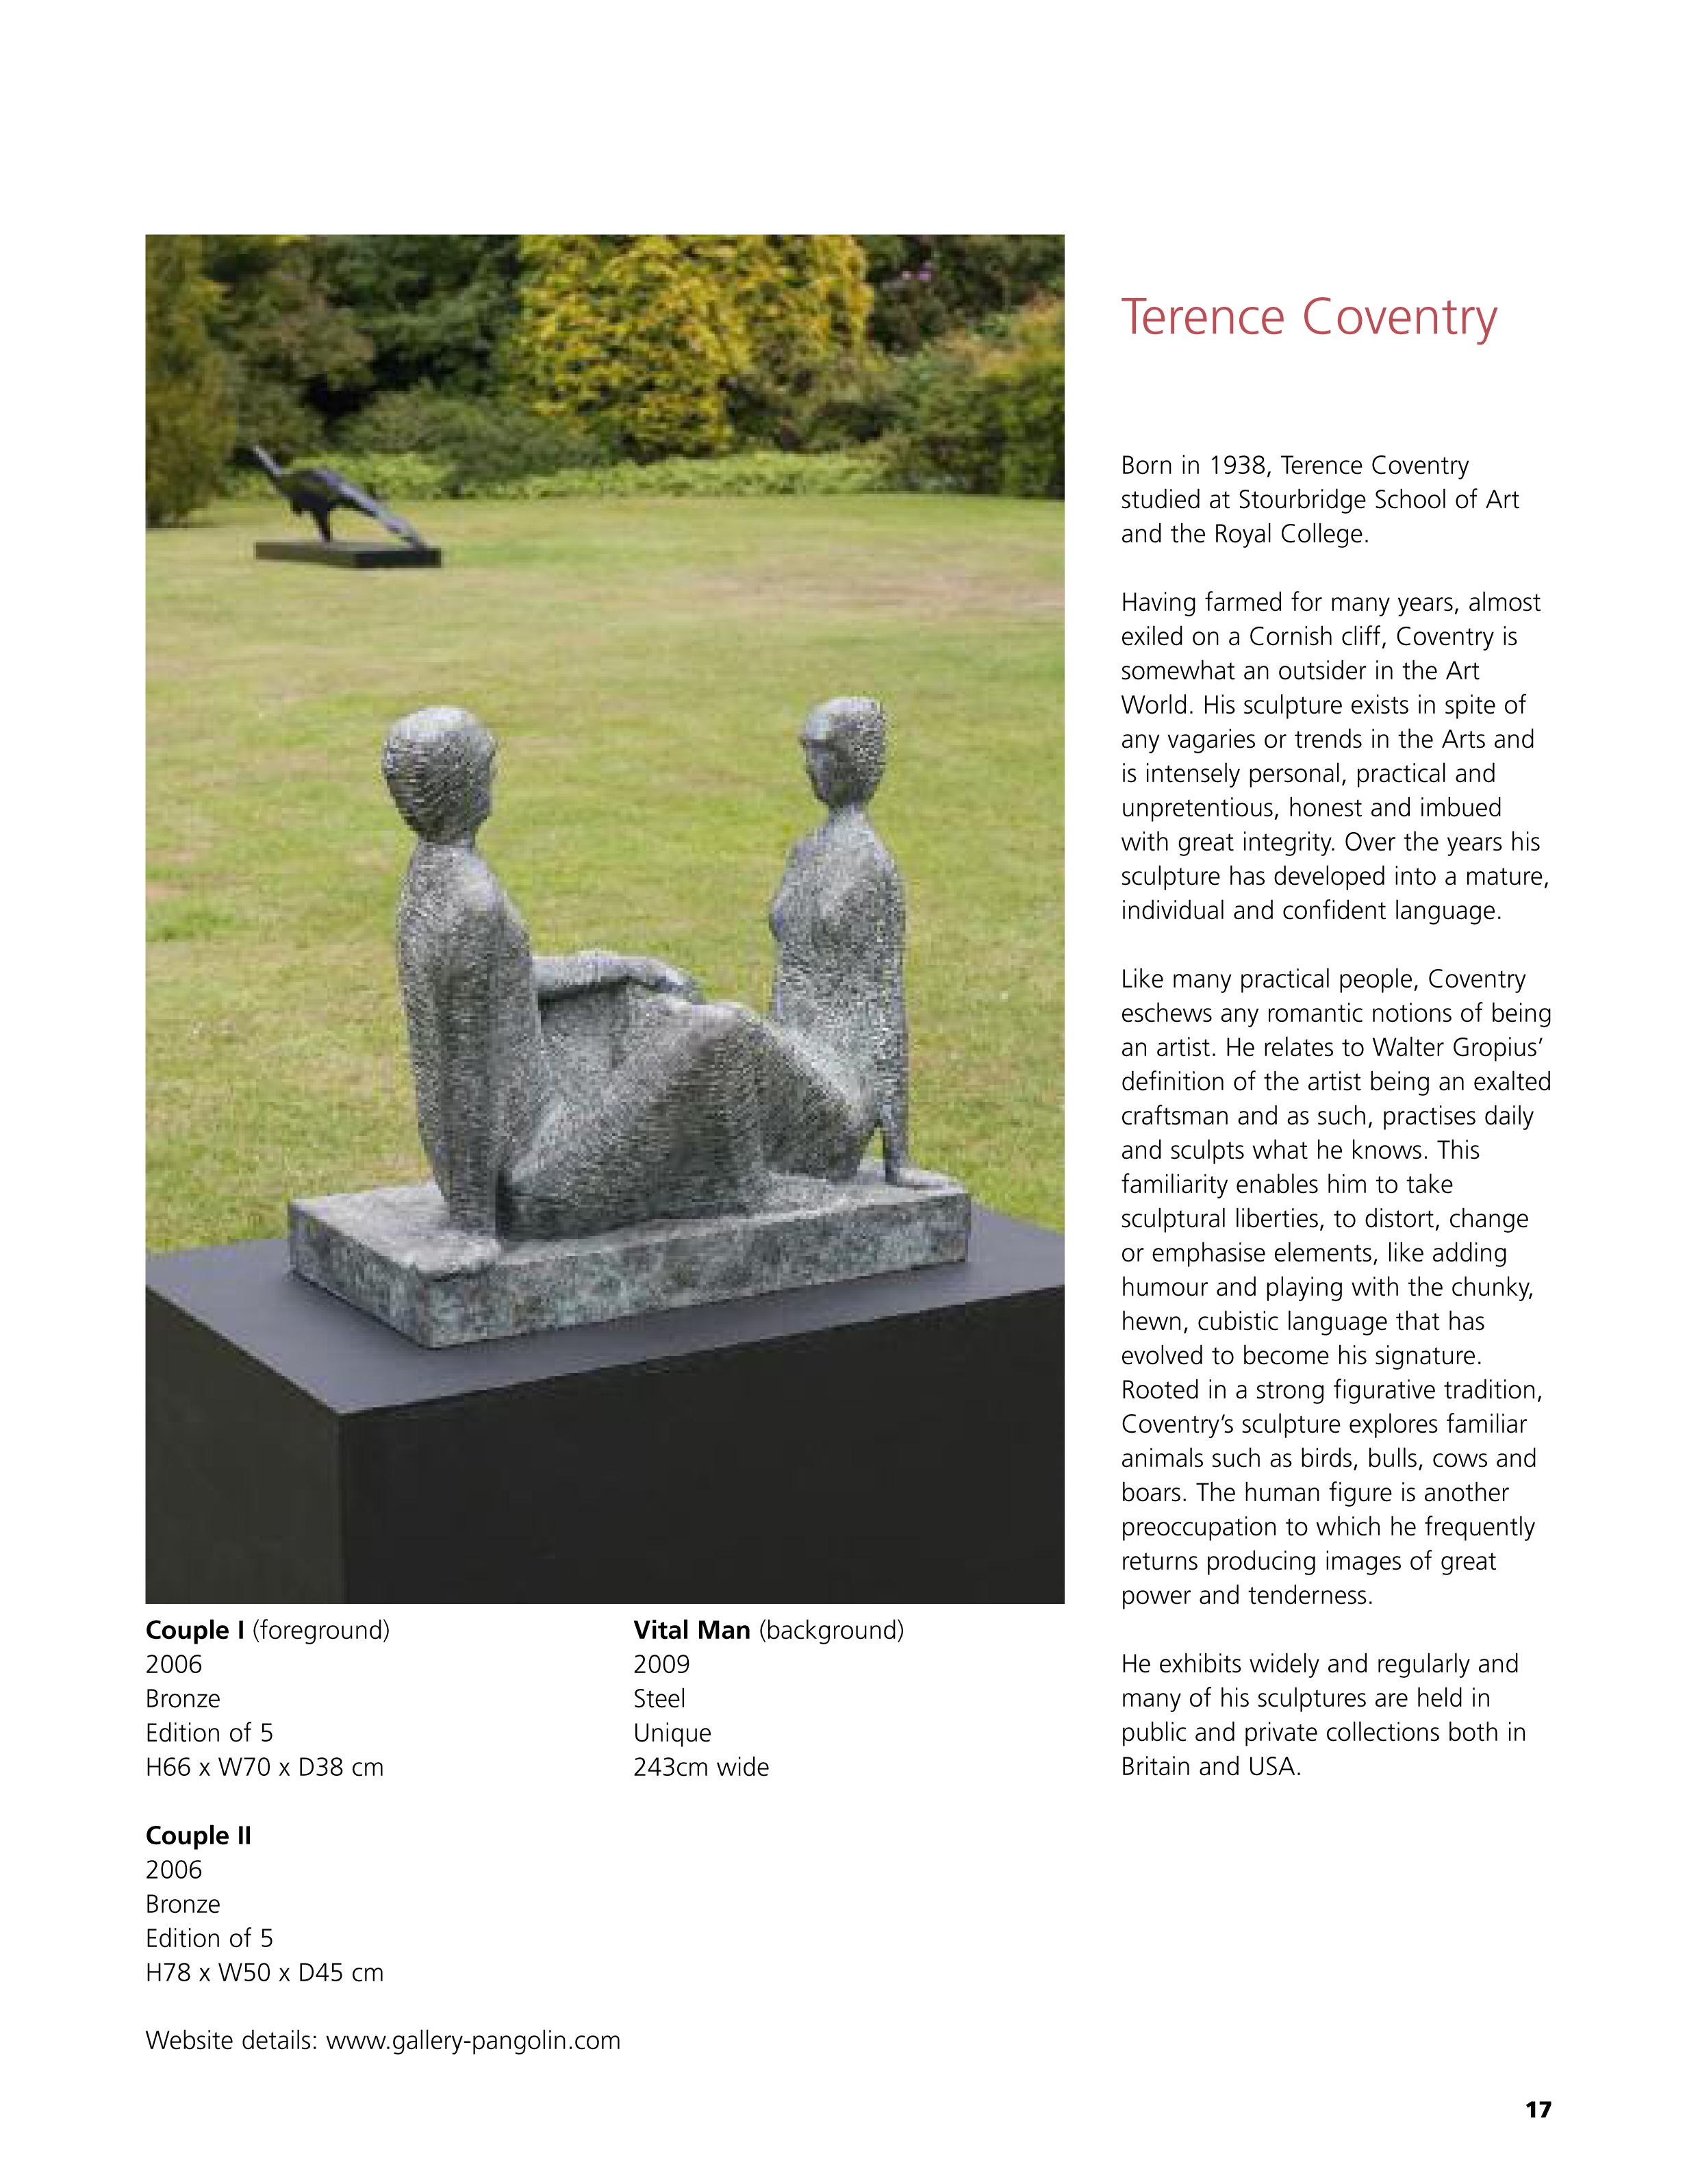 sculpturebooklet 2010 Leicester-17.jpg